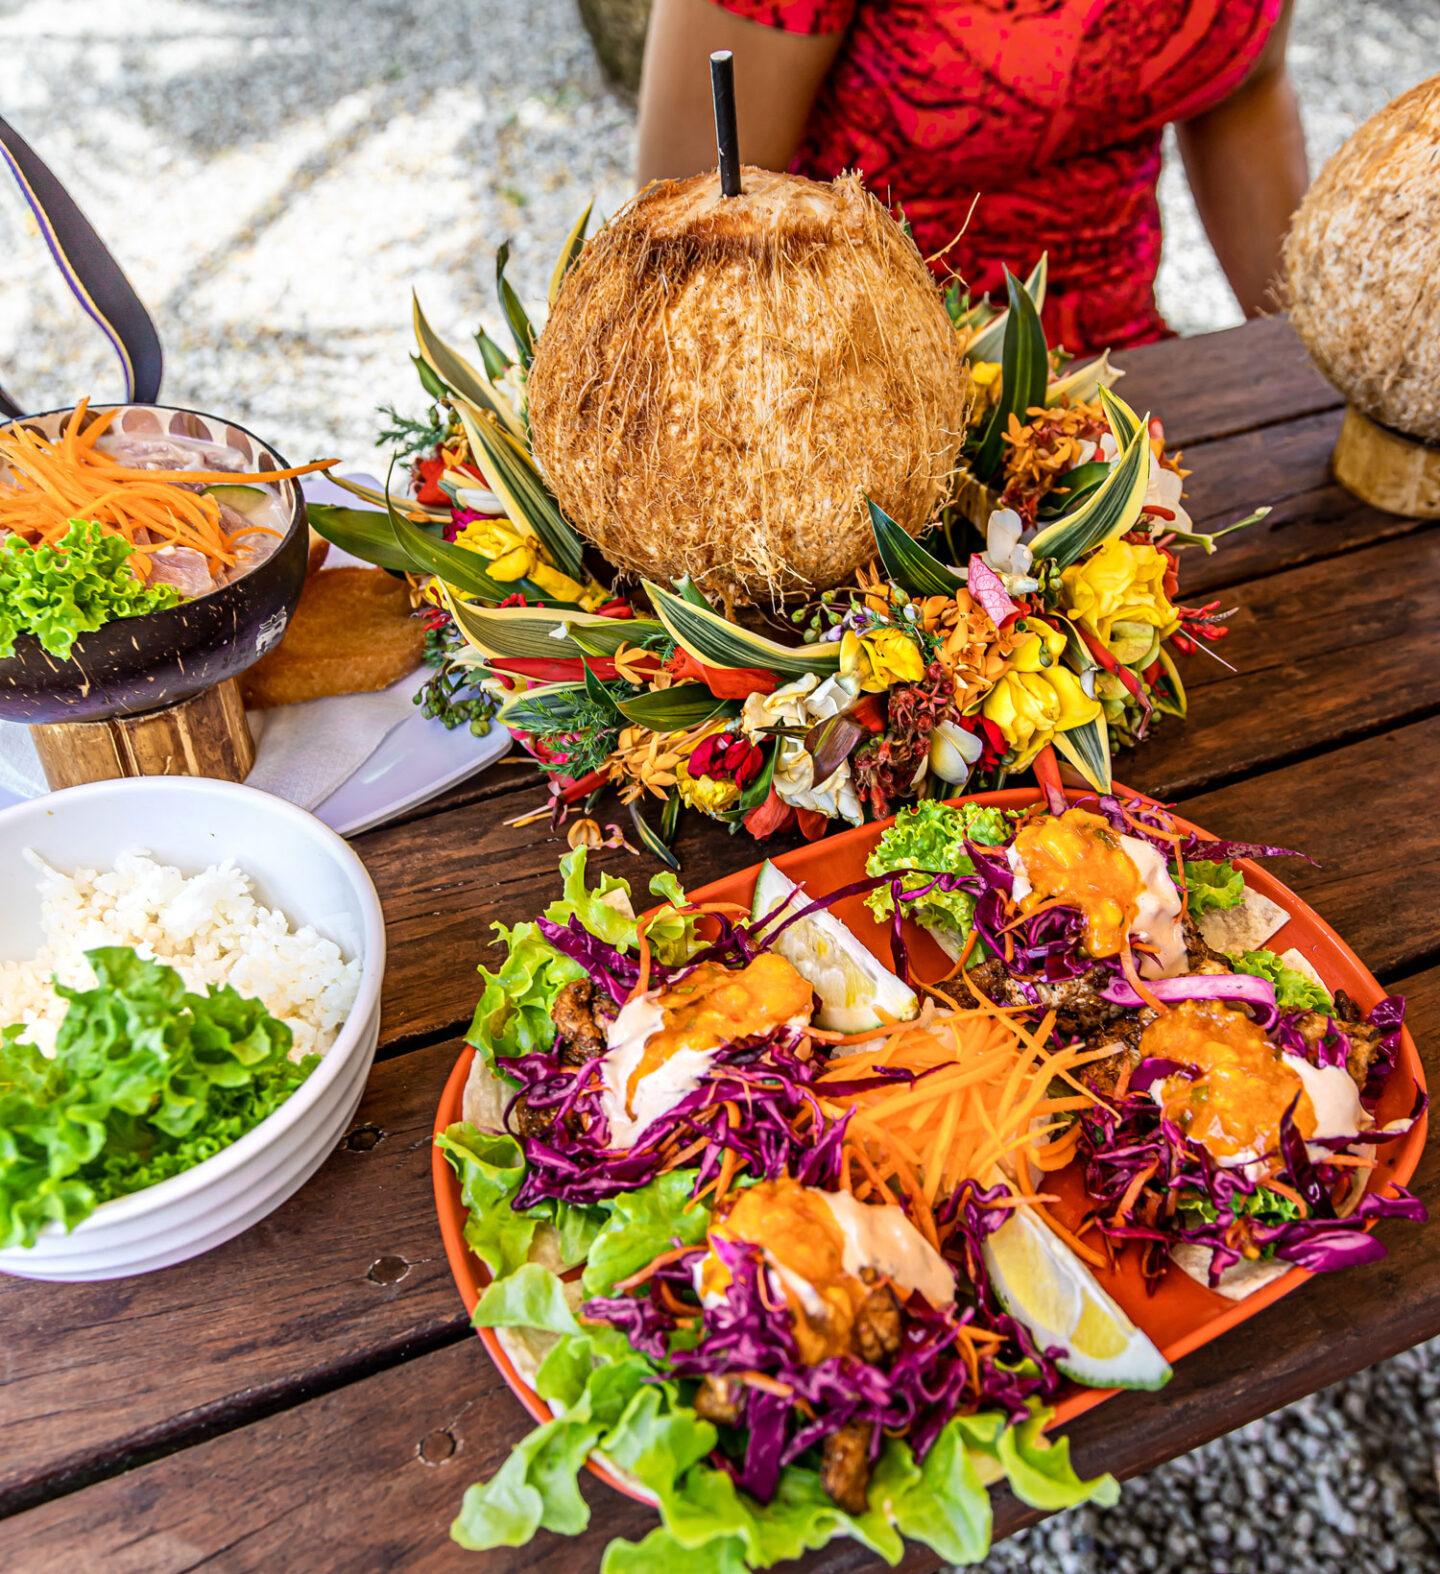 Lunch at The Mooring Fish Cafe Cook-Islands-Travel-Guide-–-Rarotonga-–-Aitutaki-–-Kelsey-Heinrichs---@kelseyinlondon